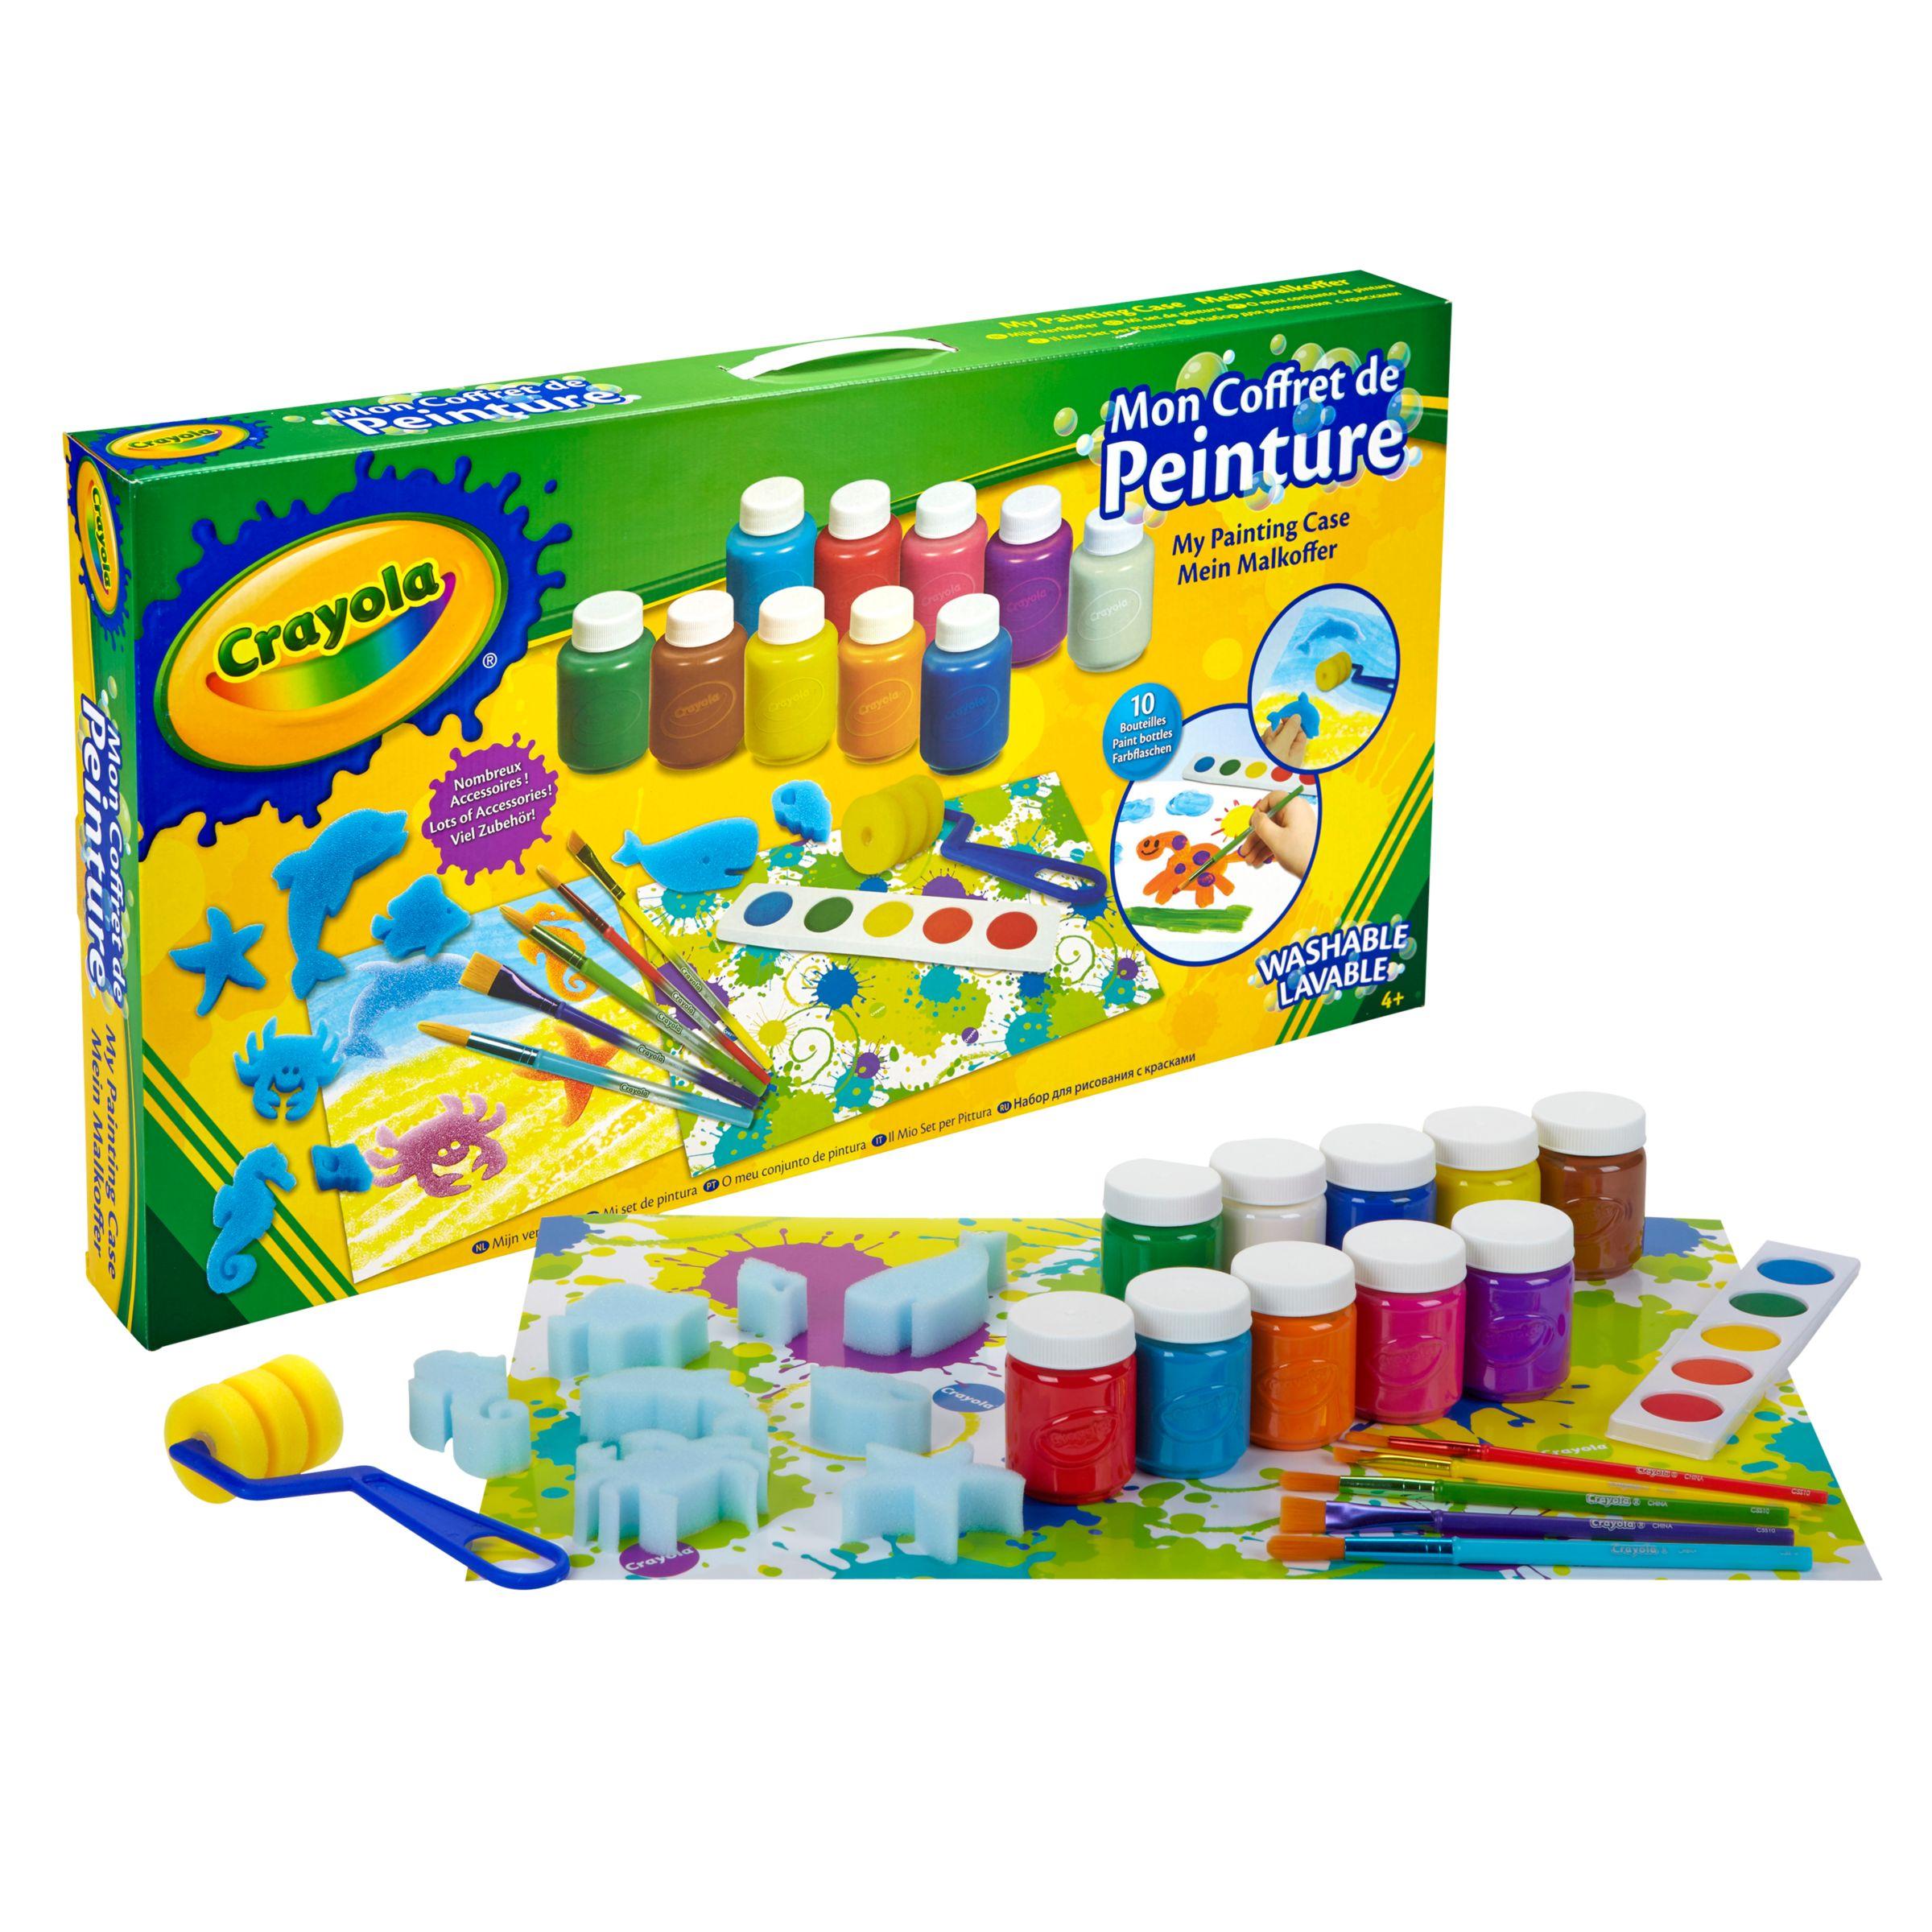 Crayola Crayola My Painting Case Kit